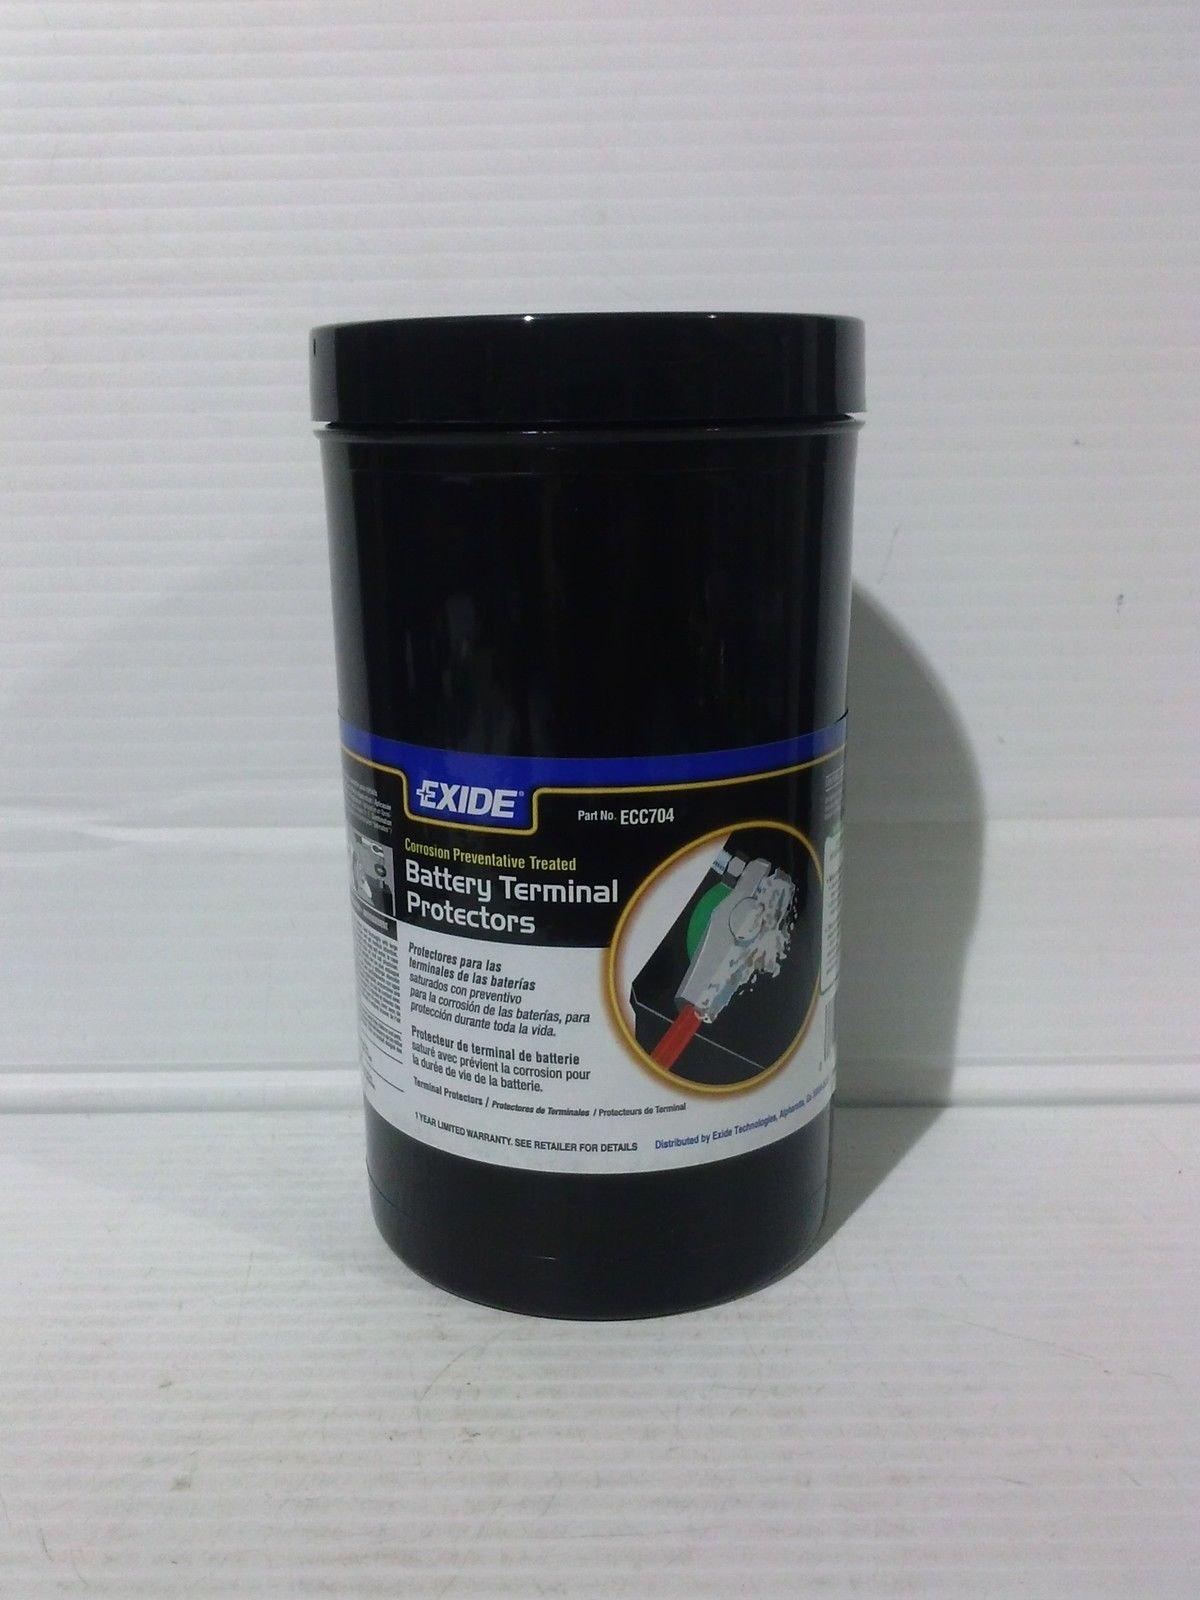 Exide Corrosion Preventative Treated Battery Terminal Protectors #ECC704